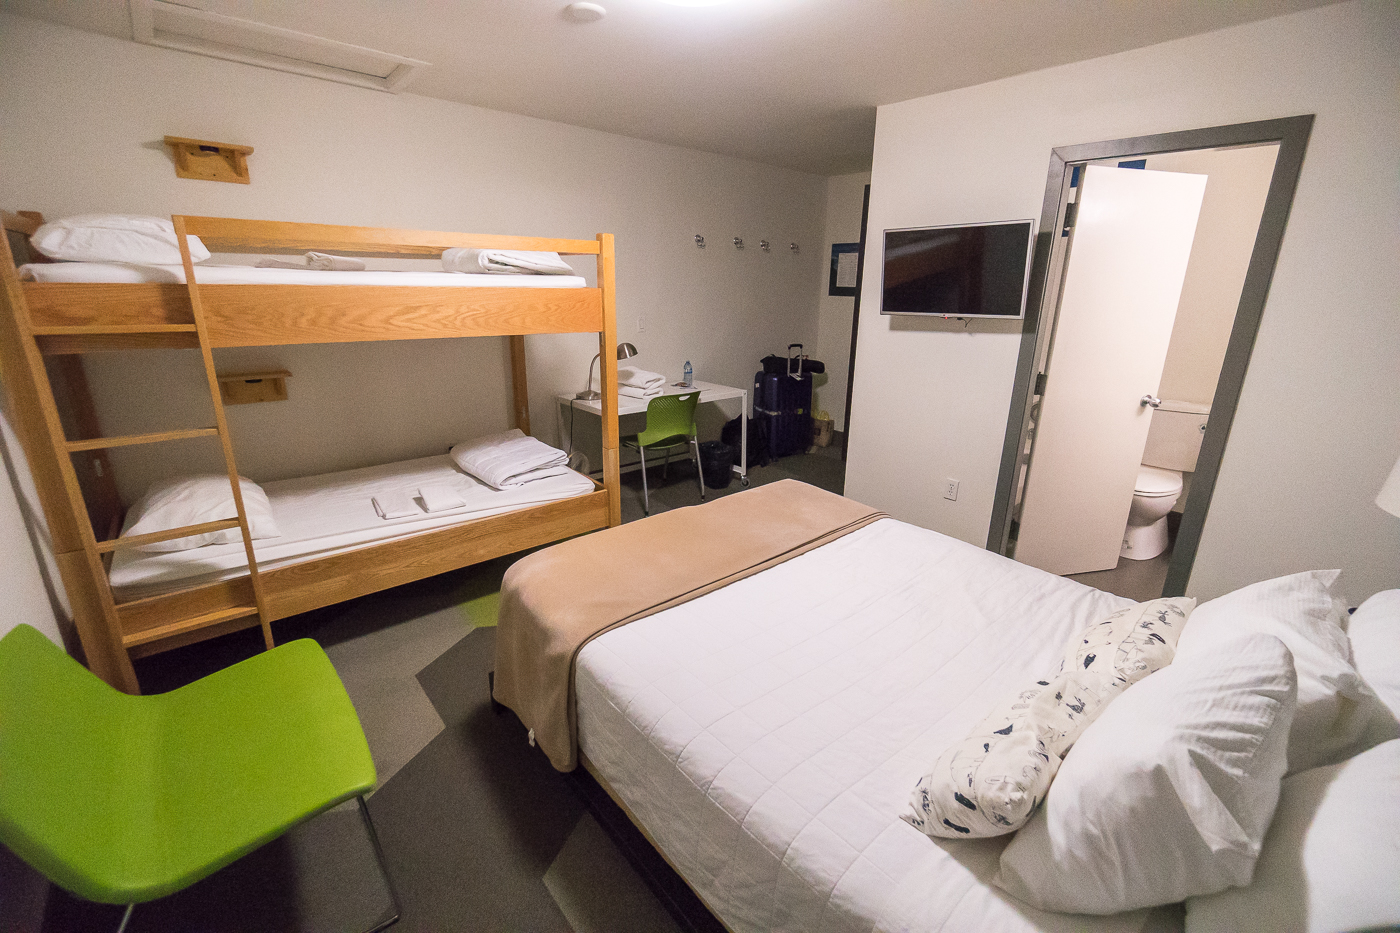 Chambre privée au HI Calgary - Où dormir en Alberta, Canada